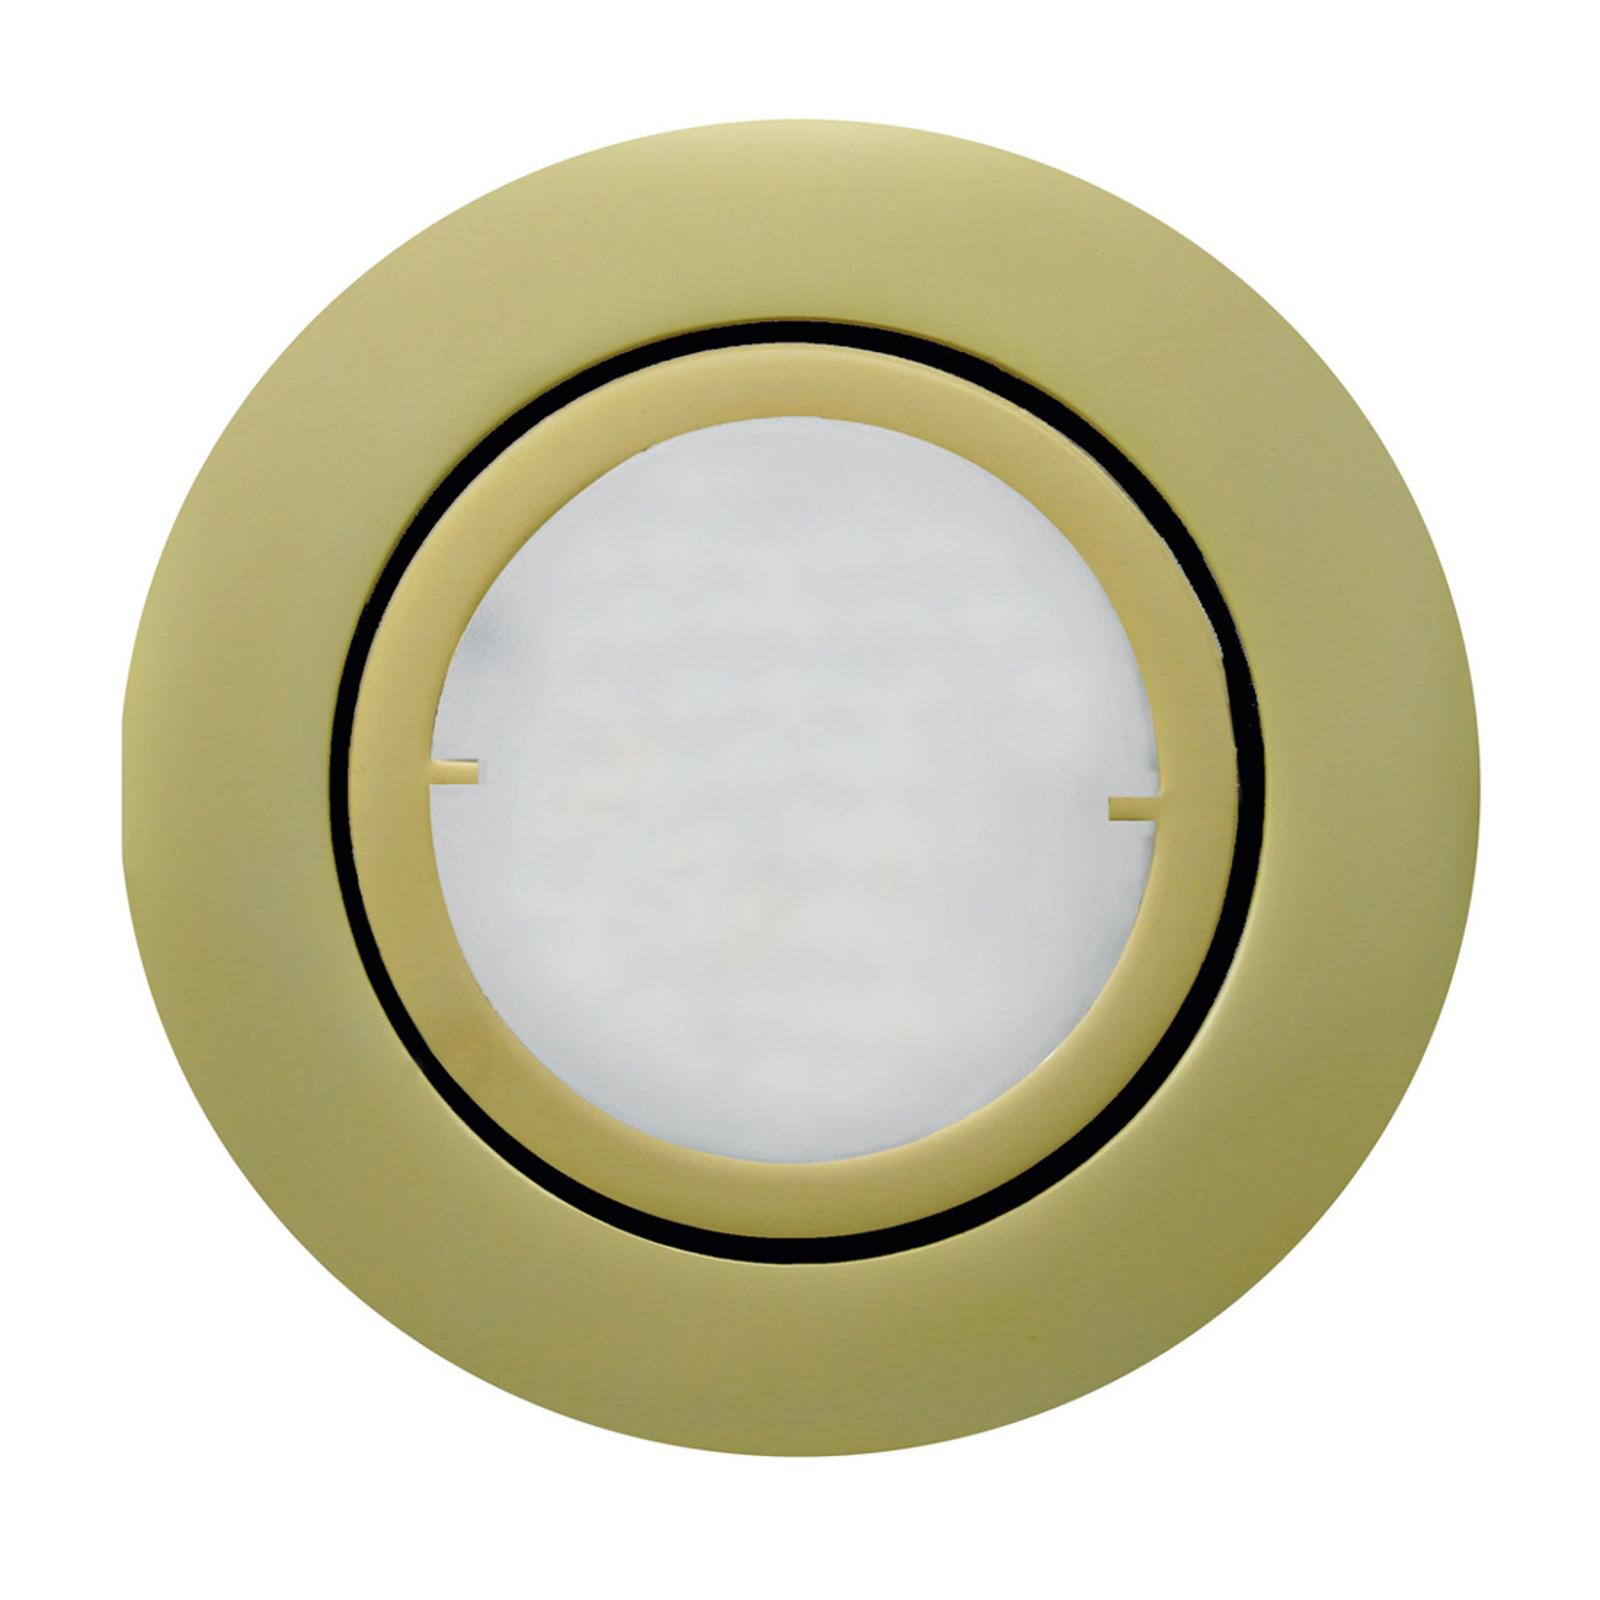 Spot LED incasso Joanie, oro satinato